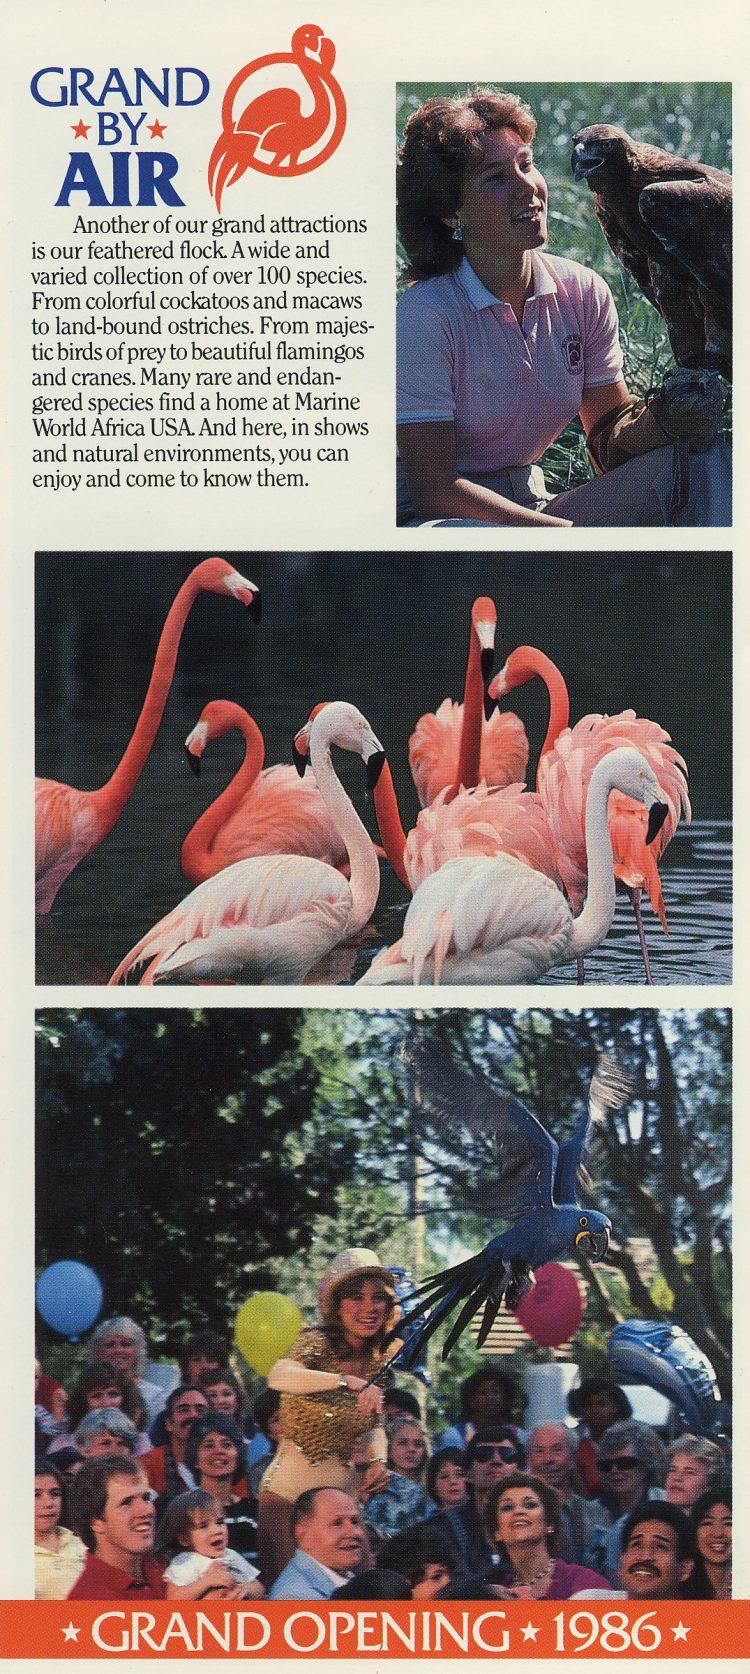 Marine World Africa USA - Grand Opening brochure 1986 (7)